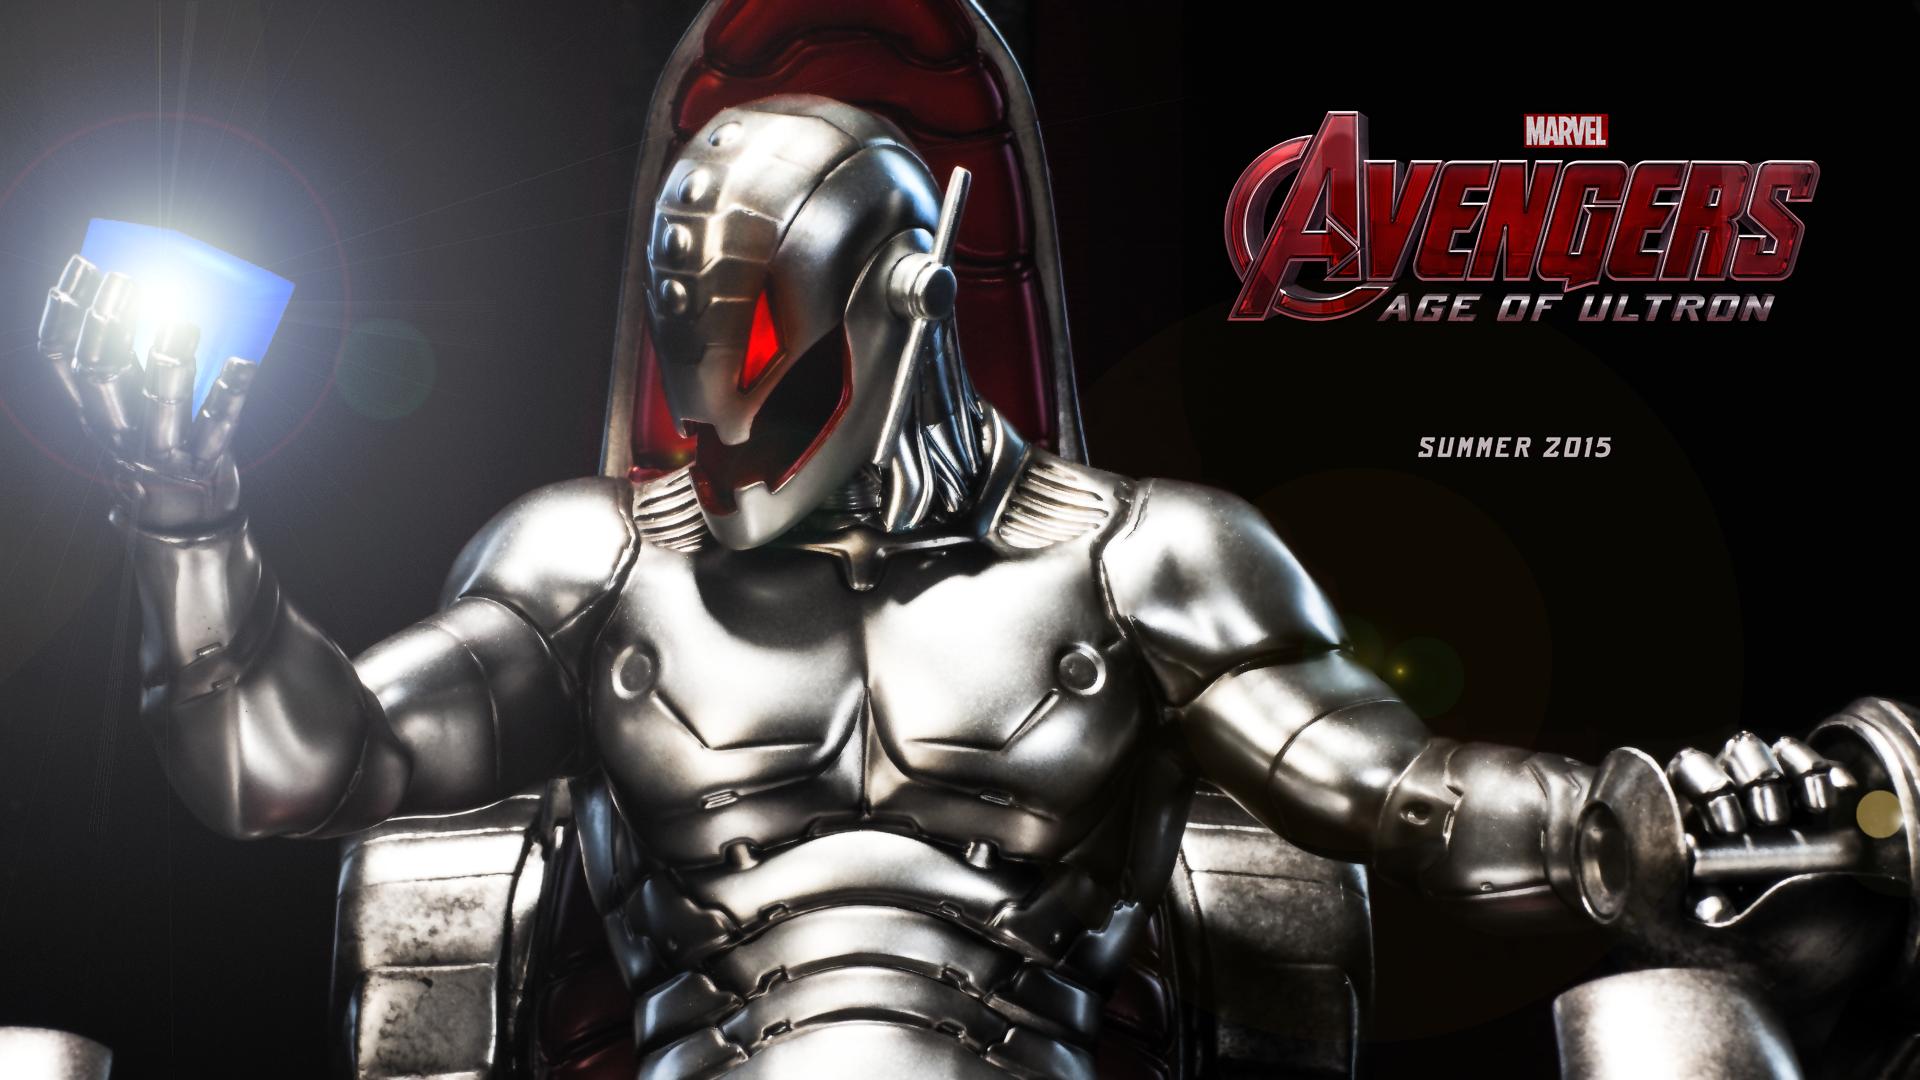 Age of Ultron comics marvel robot warrior armor g wallpaper background 1920x1080